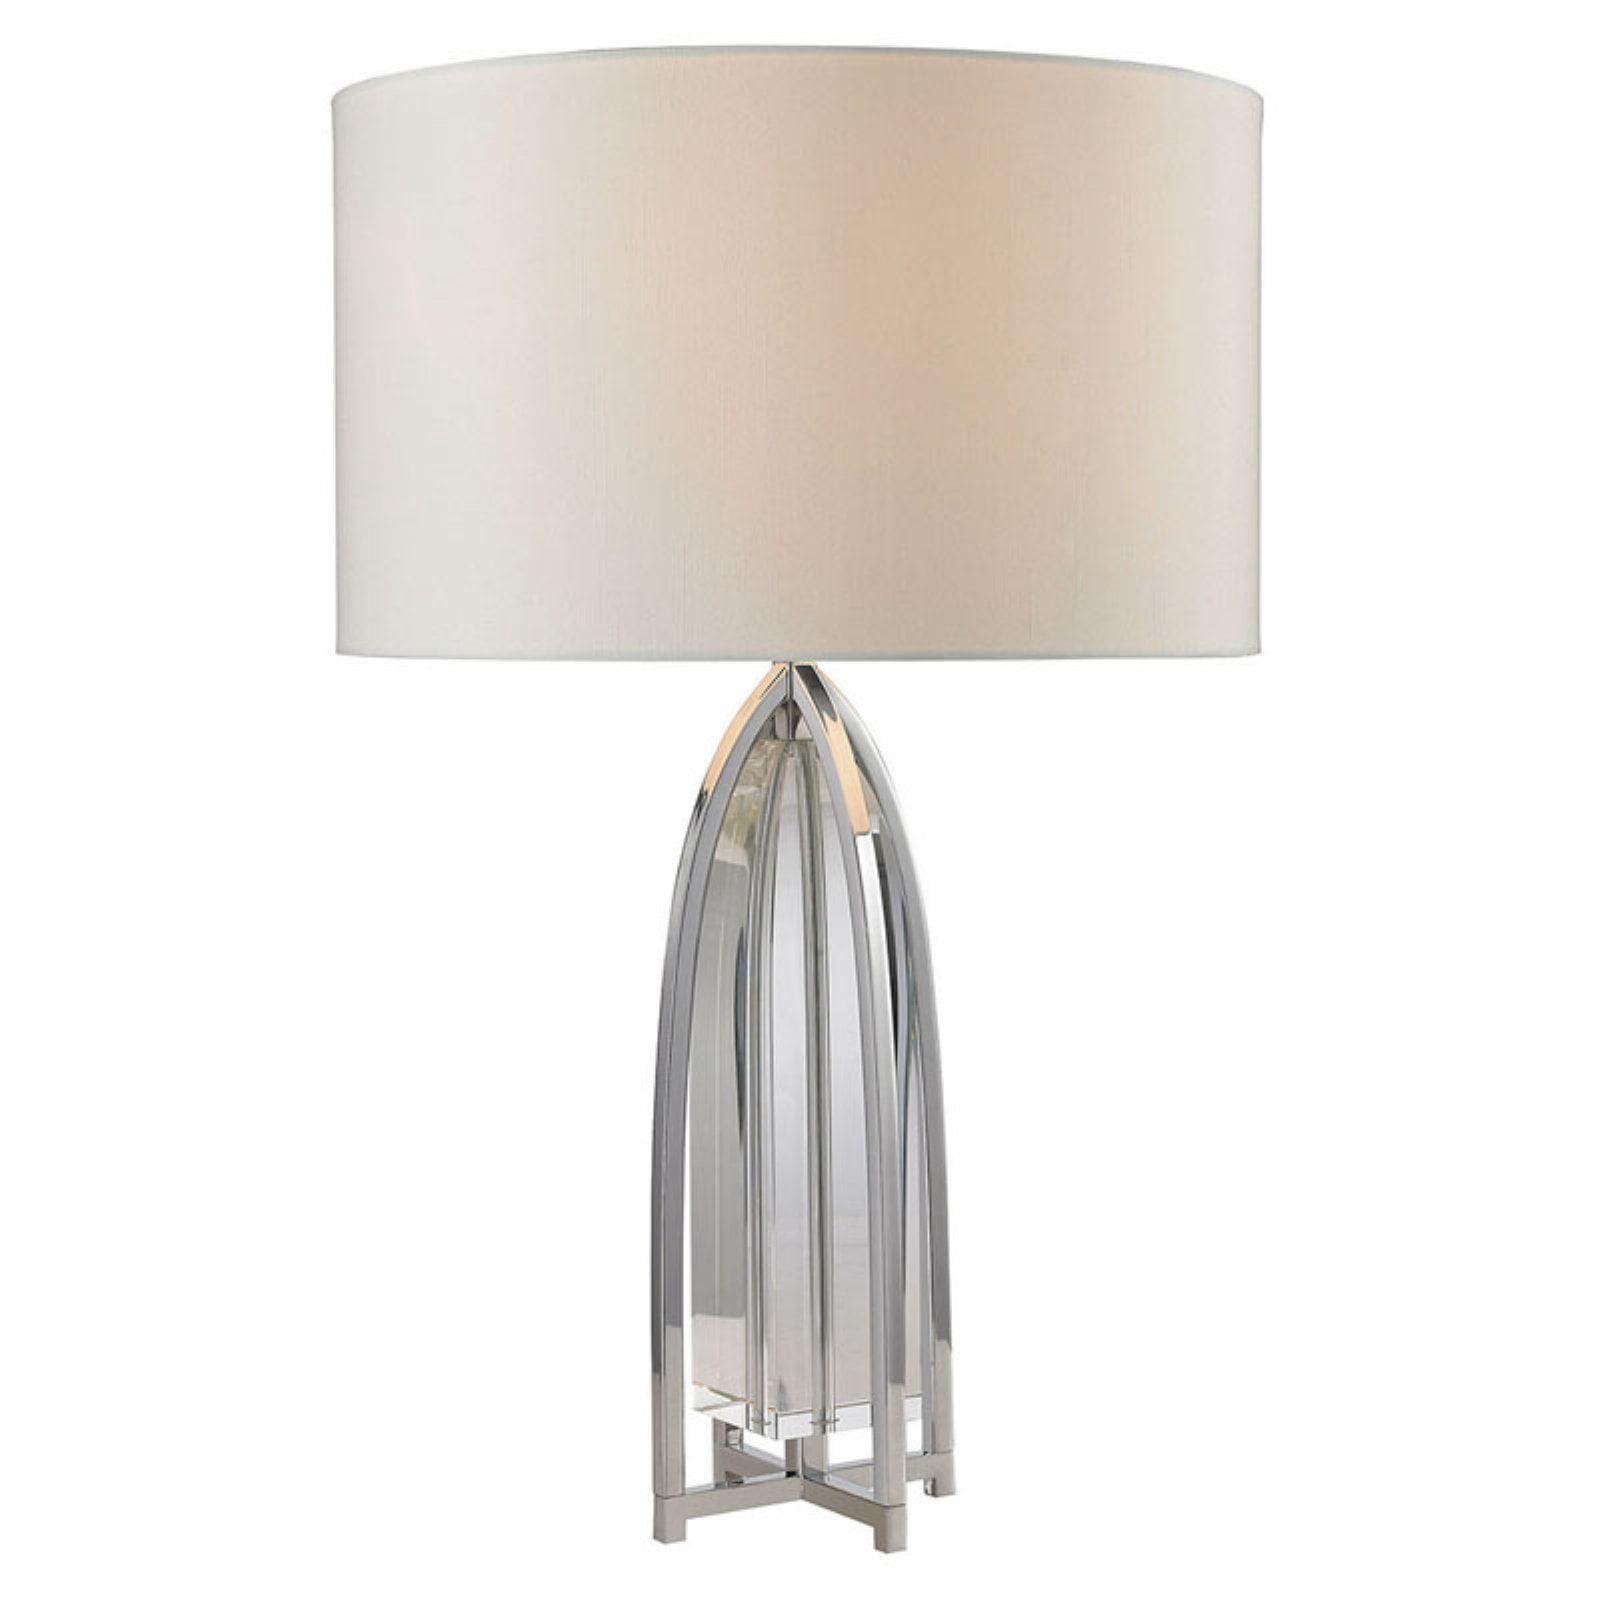 Dimond Lighting Trump Home Wheeler Crystal Table Lamp